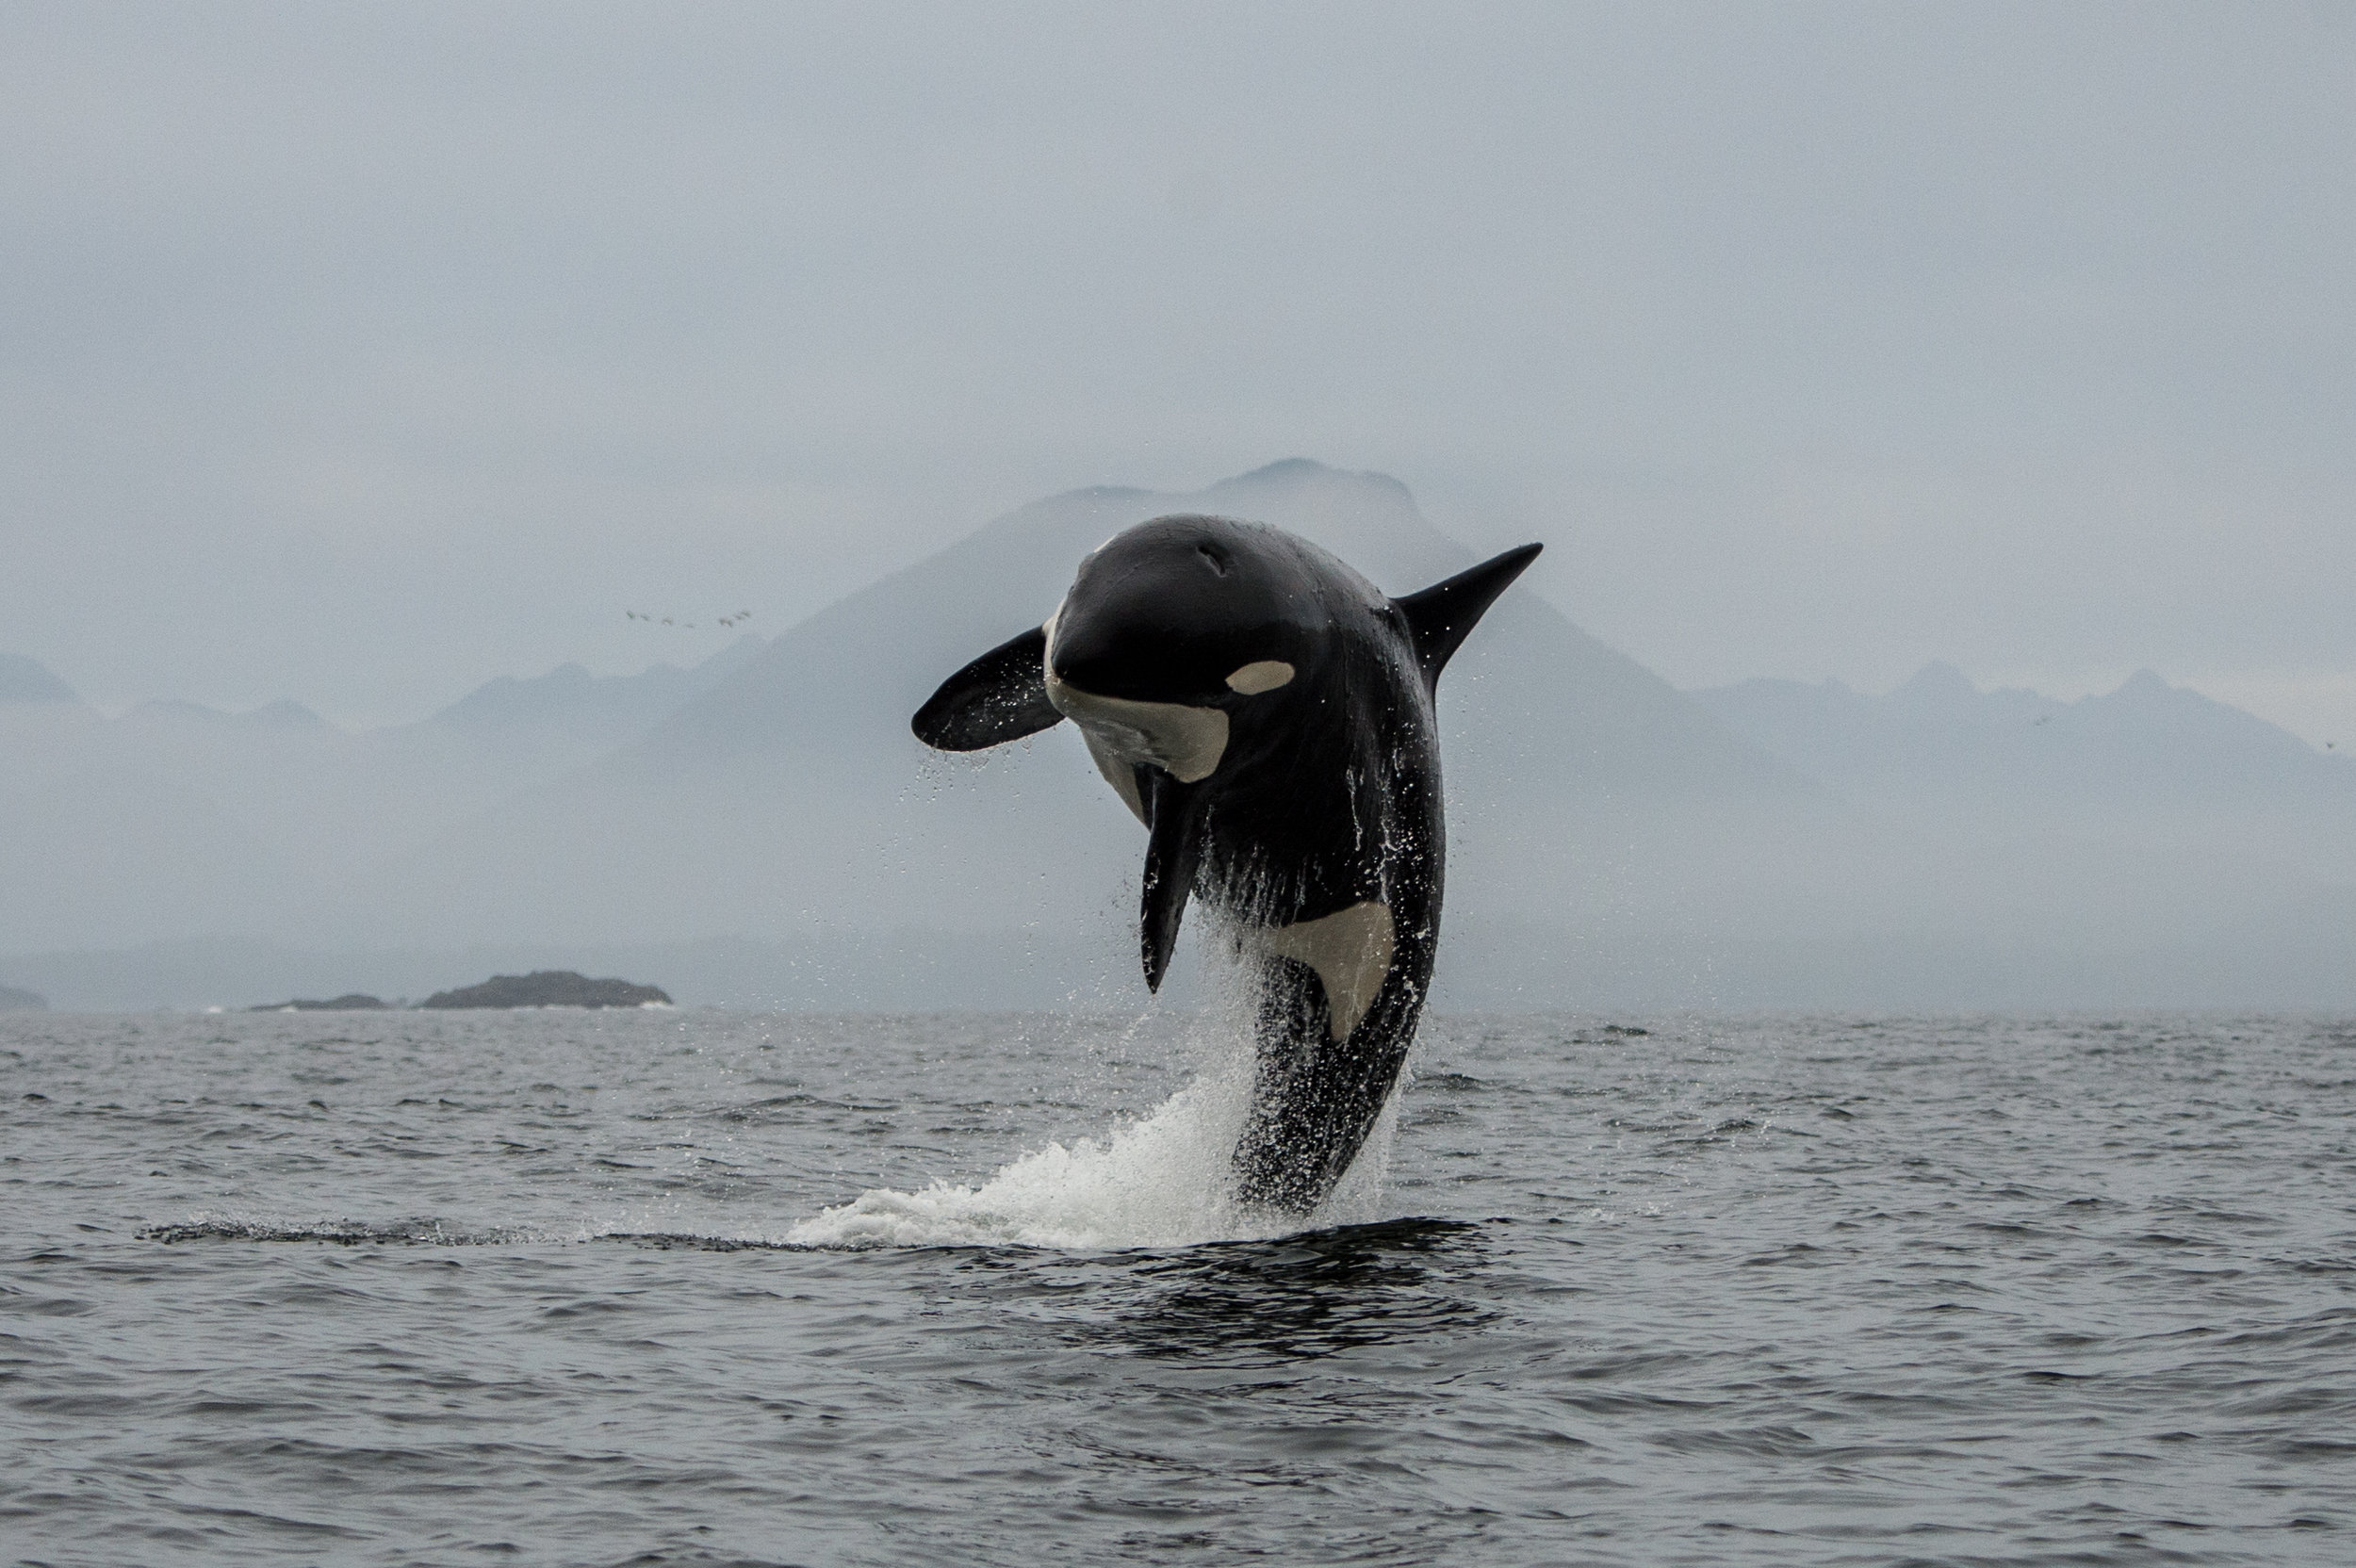 Tofino Whale Watching Tour